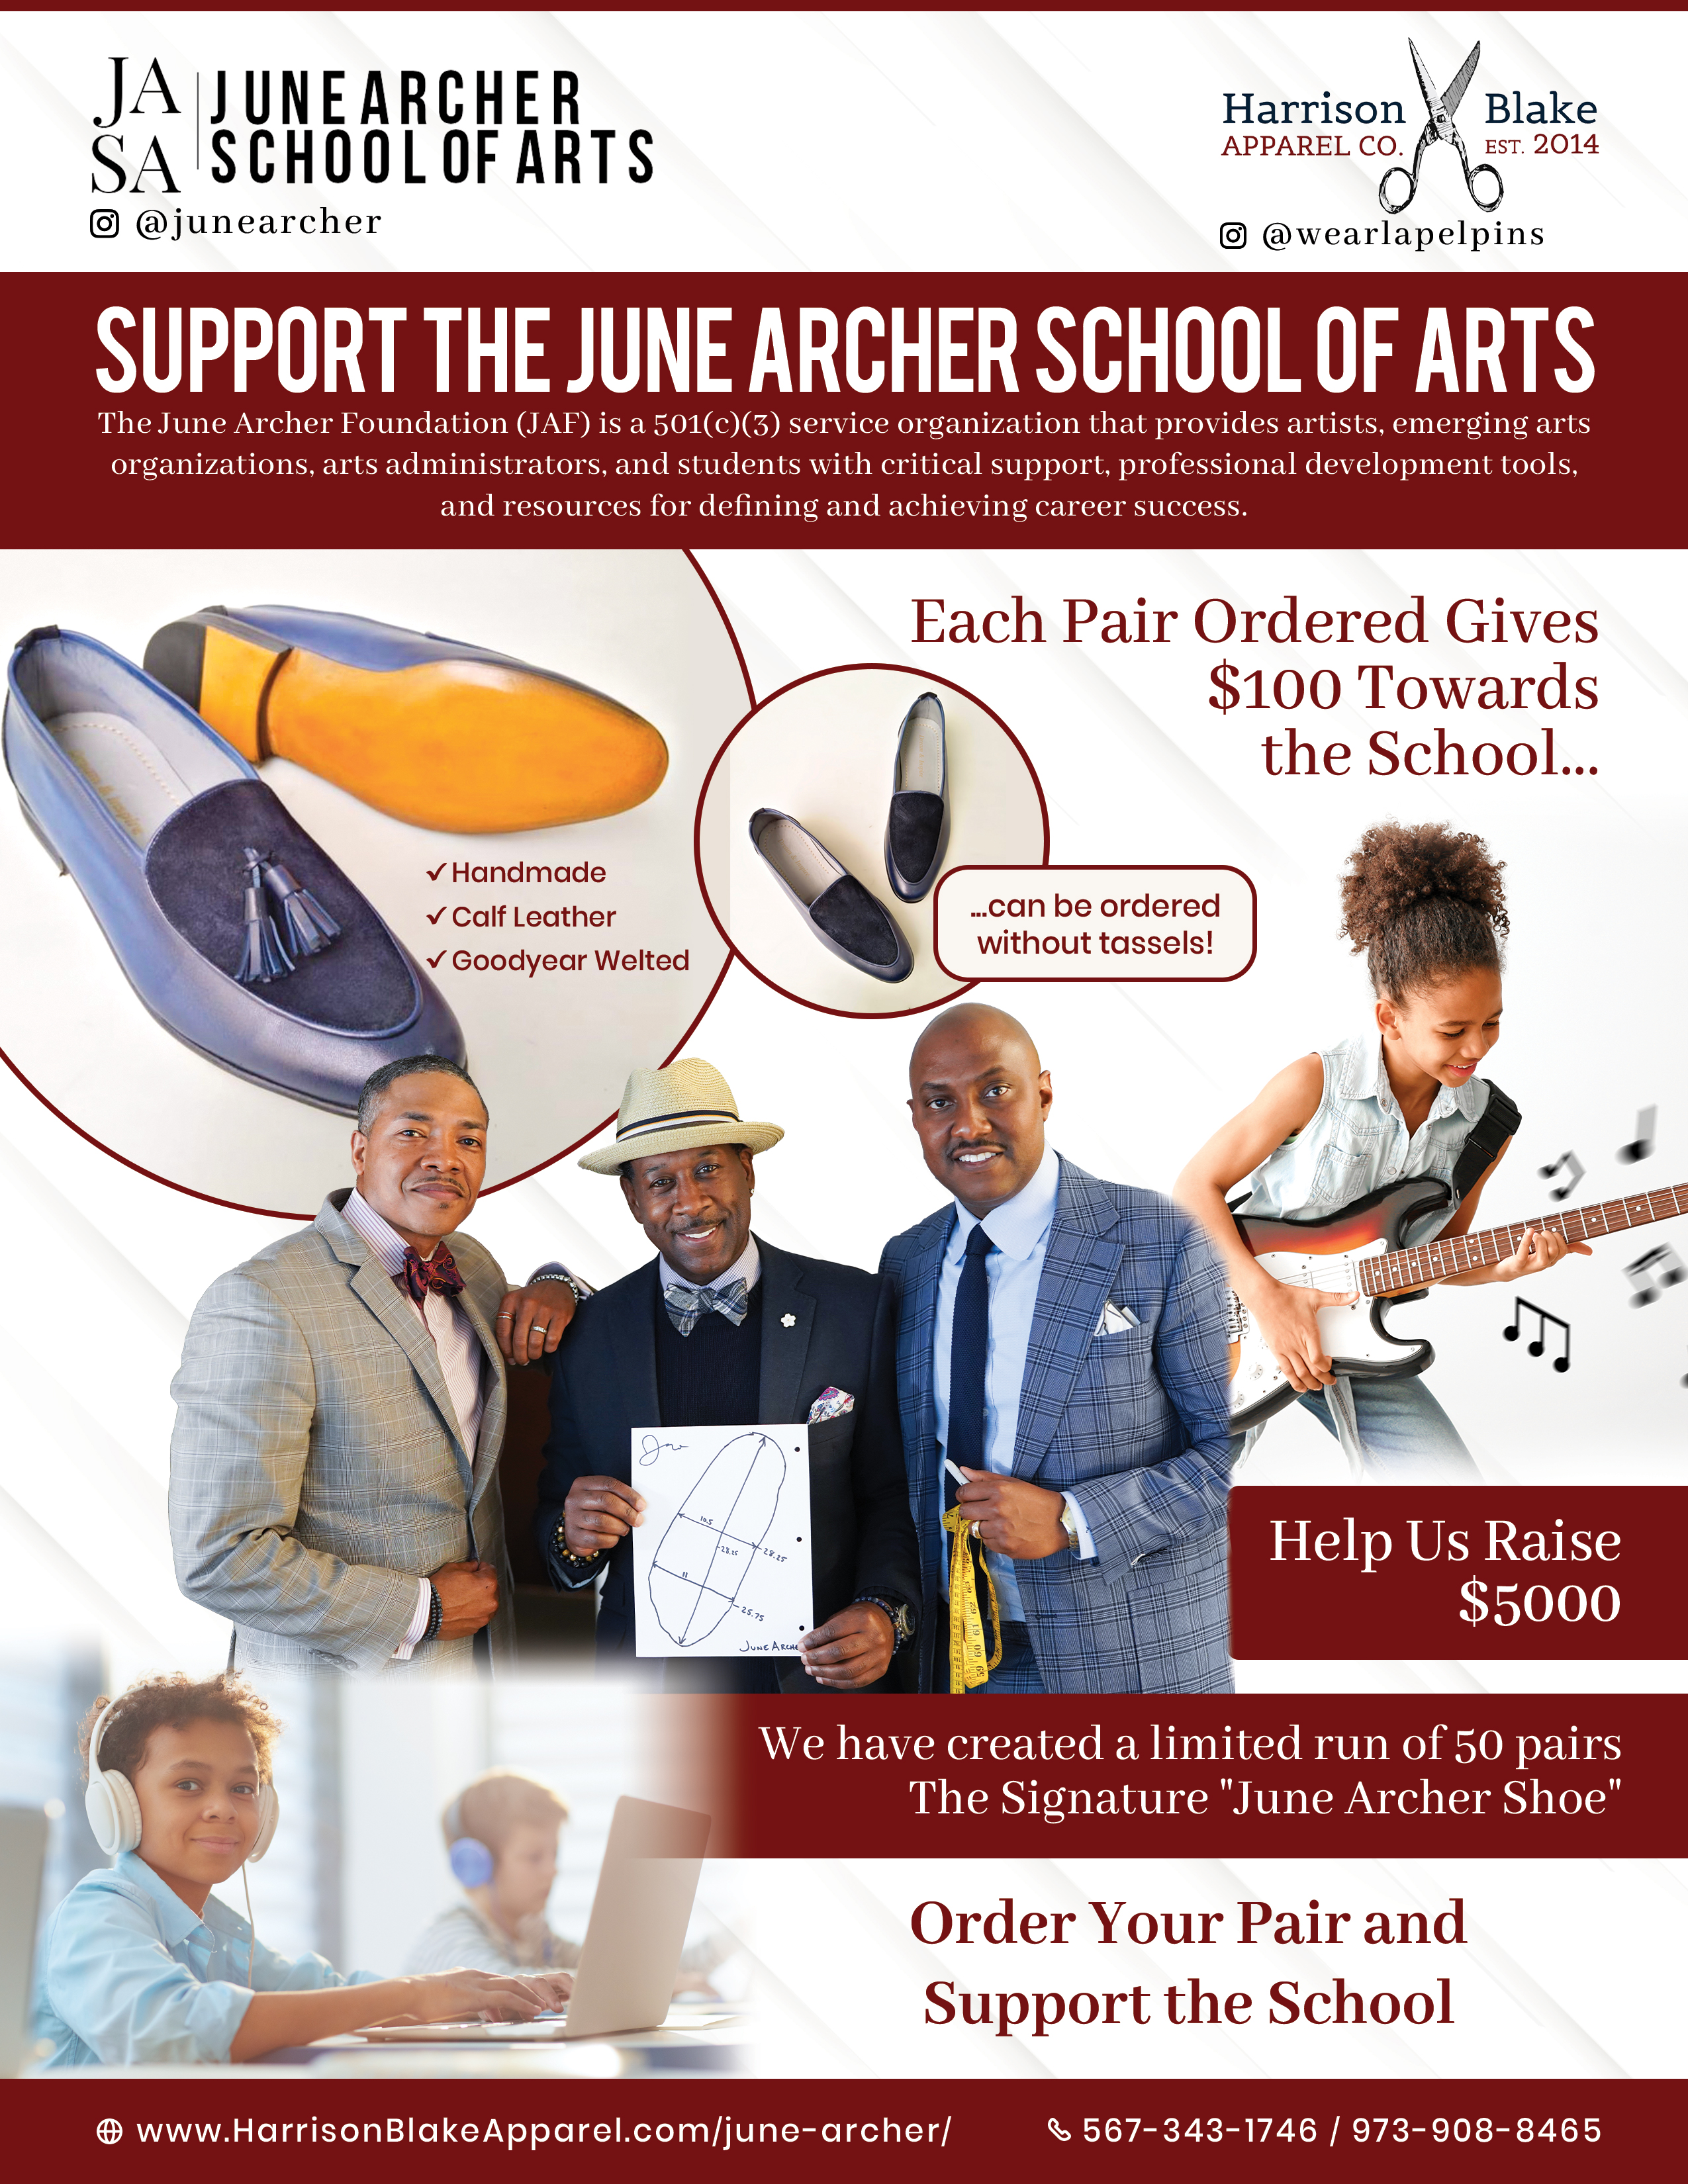 support-the-june-archer-school-of-arts-flyer-artwork-rgb-.jpg